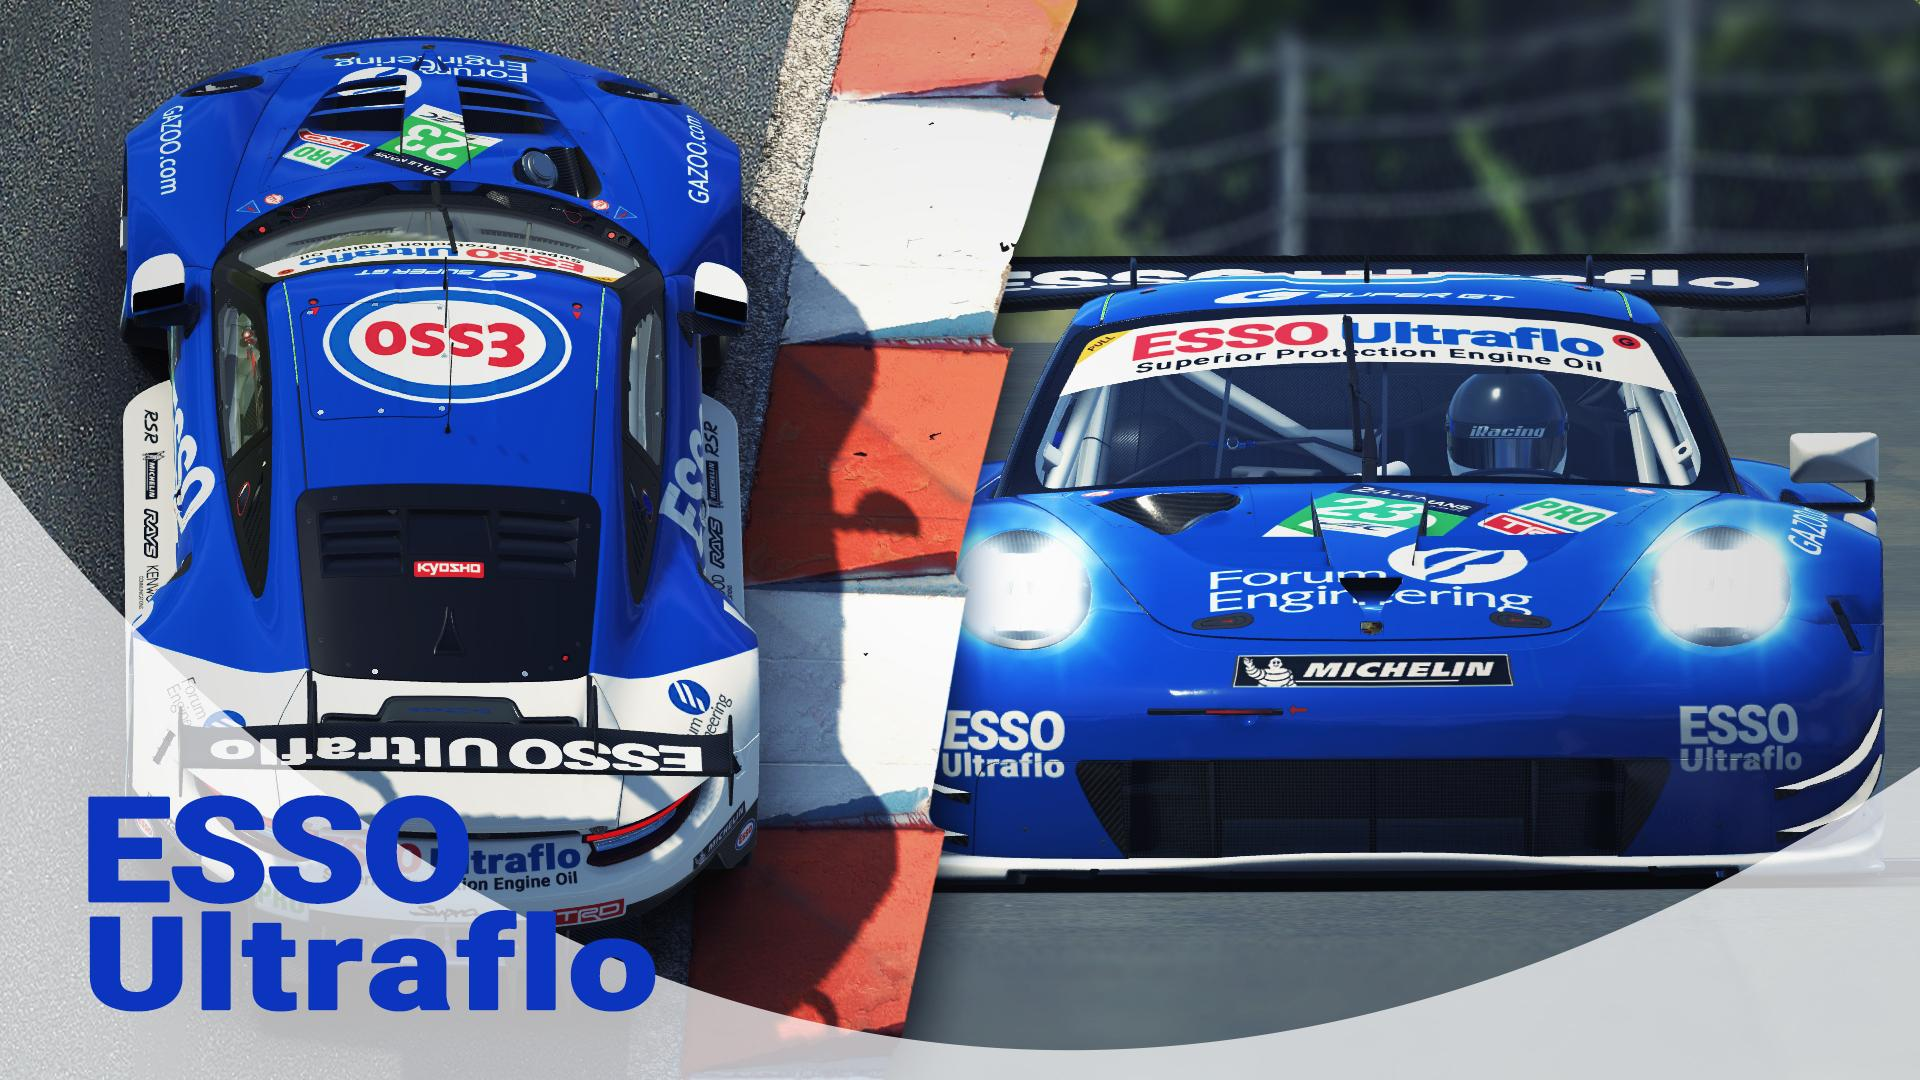 Preview of Super-GT Legends - Toyota ESSO ULTRAFLO Supra (JGTC) by Thomas Engelns